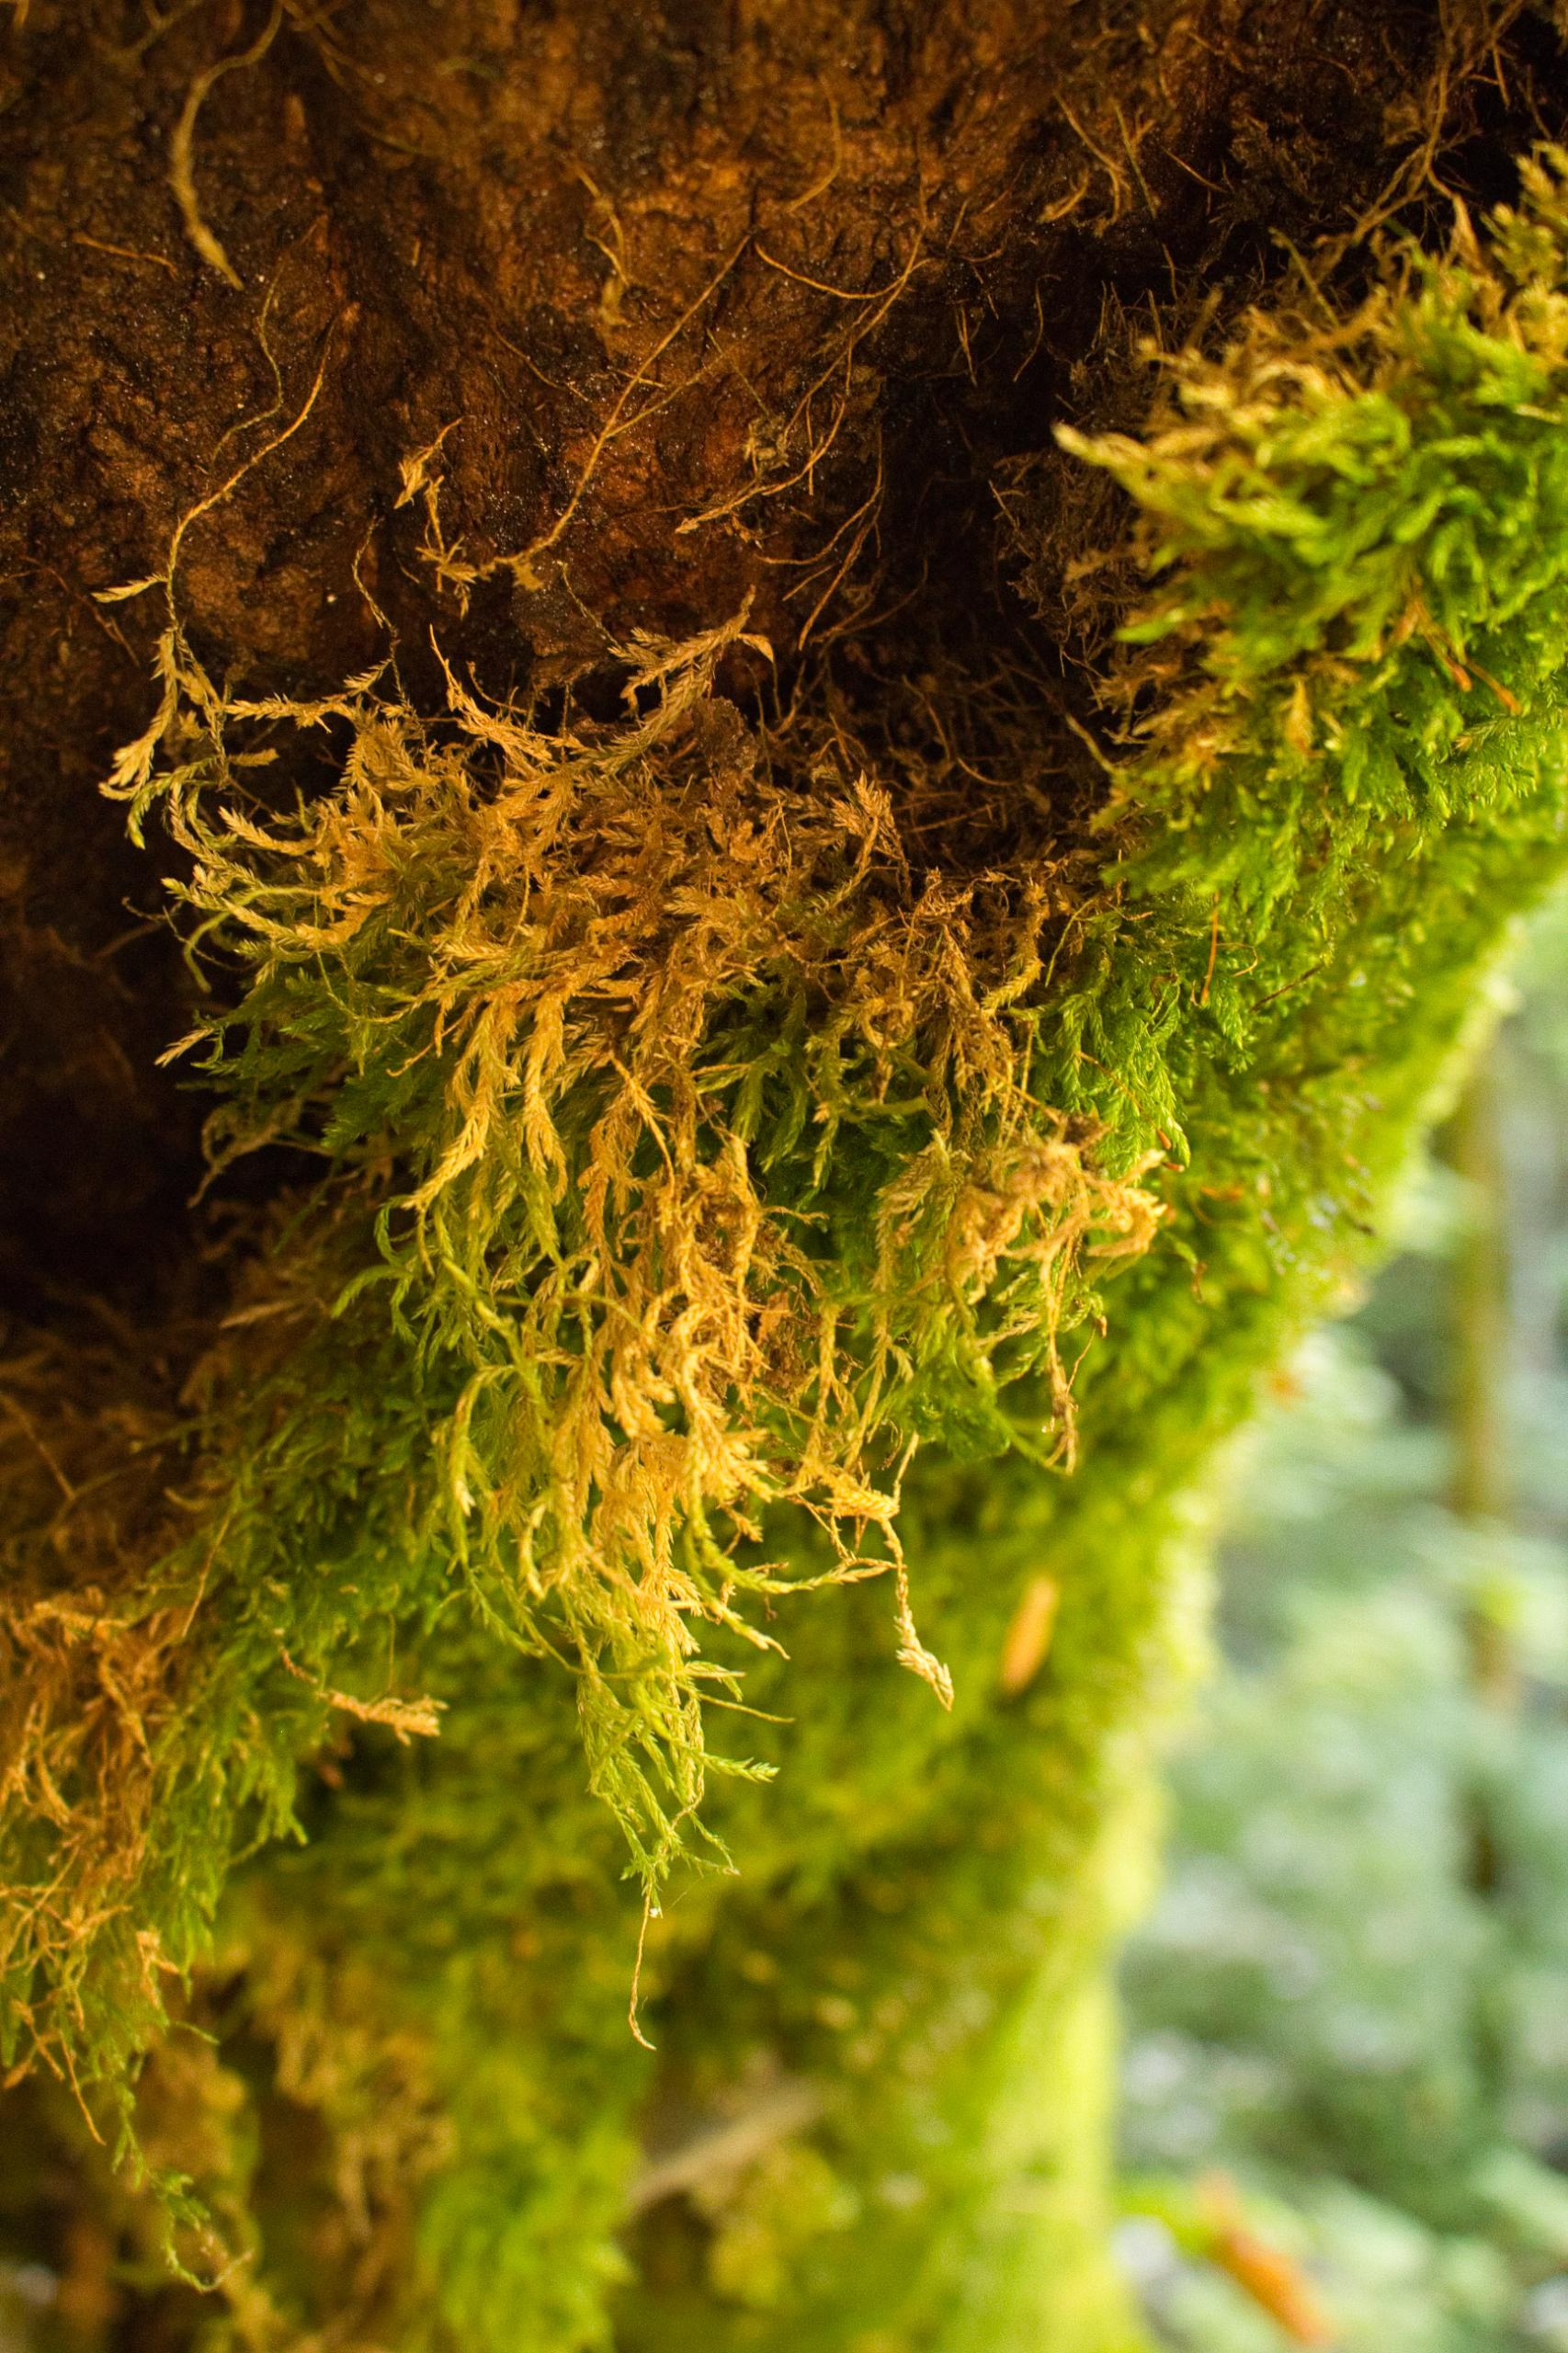 Moosbedeckte Baumstämme